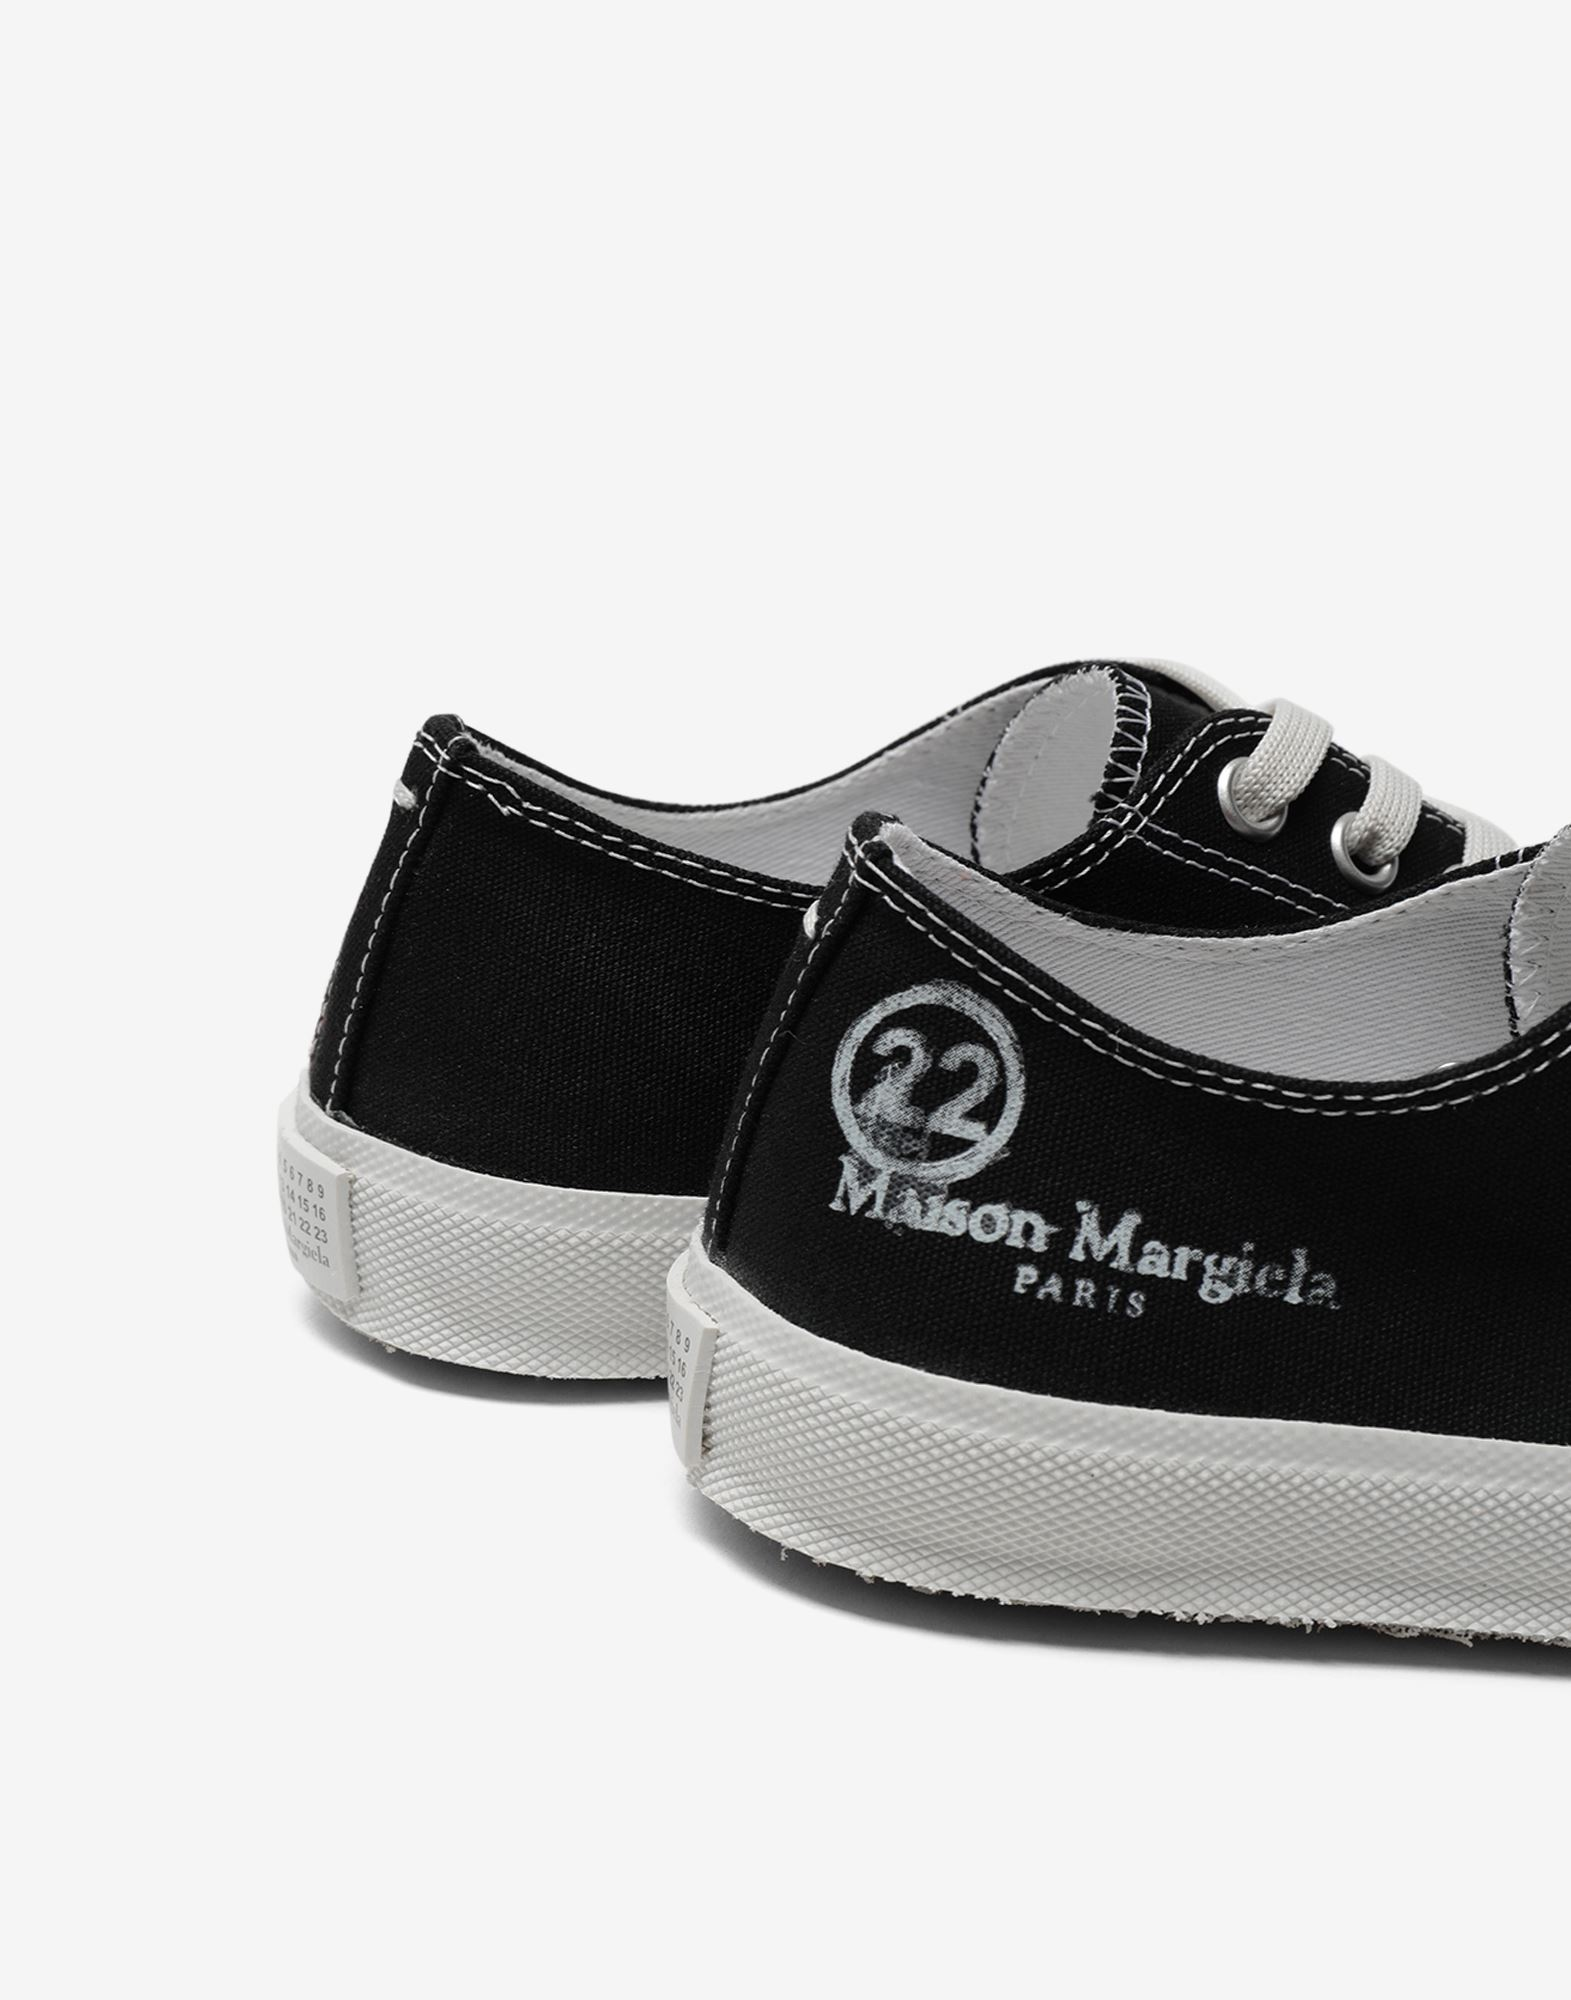 MAISON MARGIELA Baskets basses Tabi en toile Sneakers Tabi Femme e